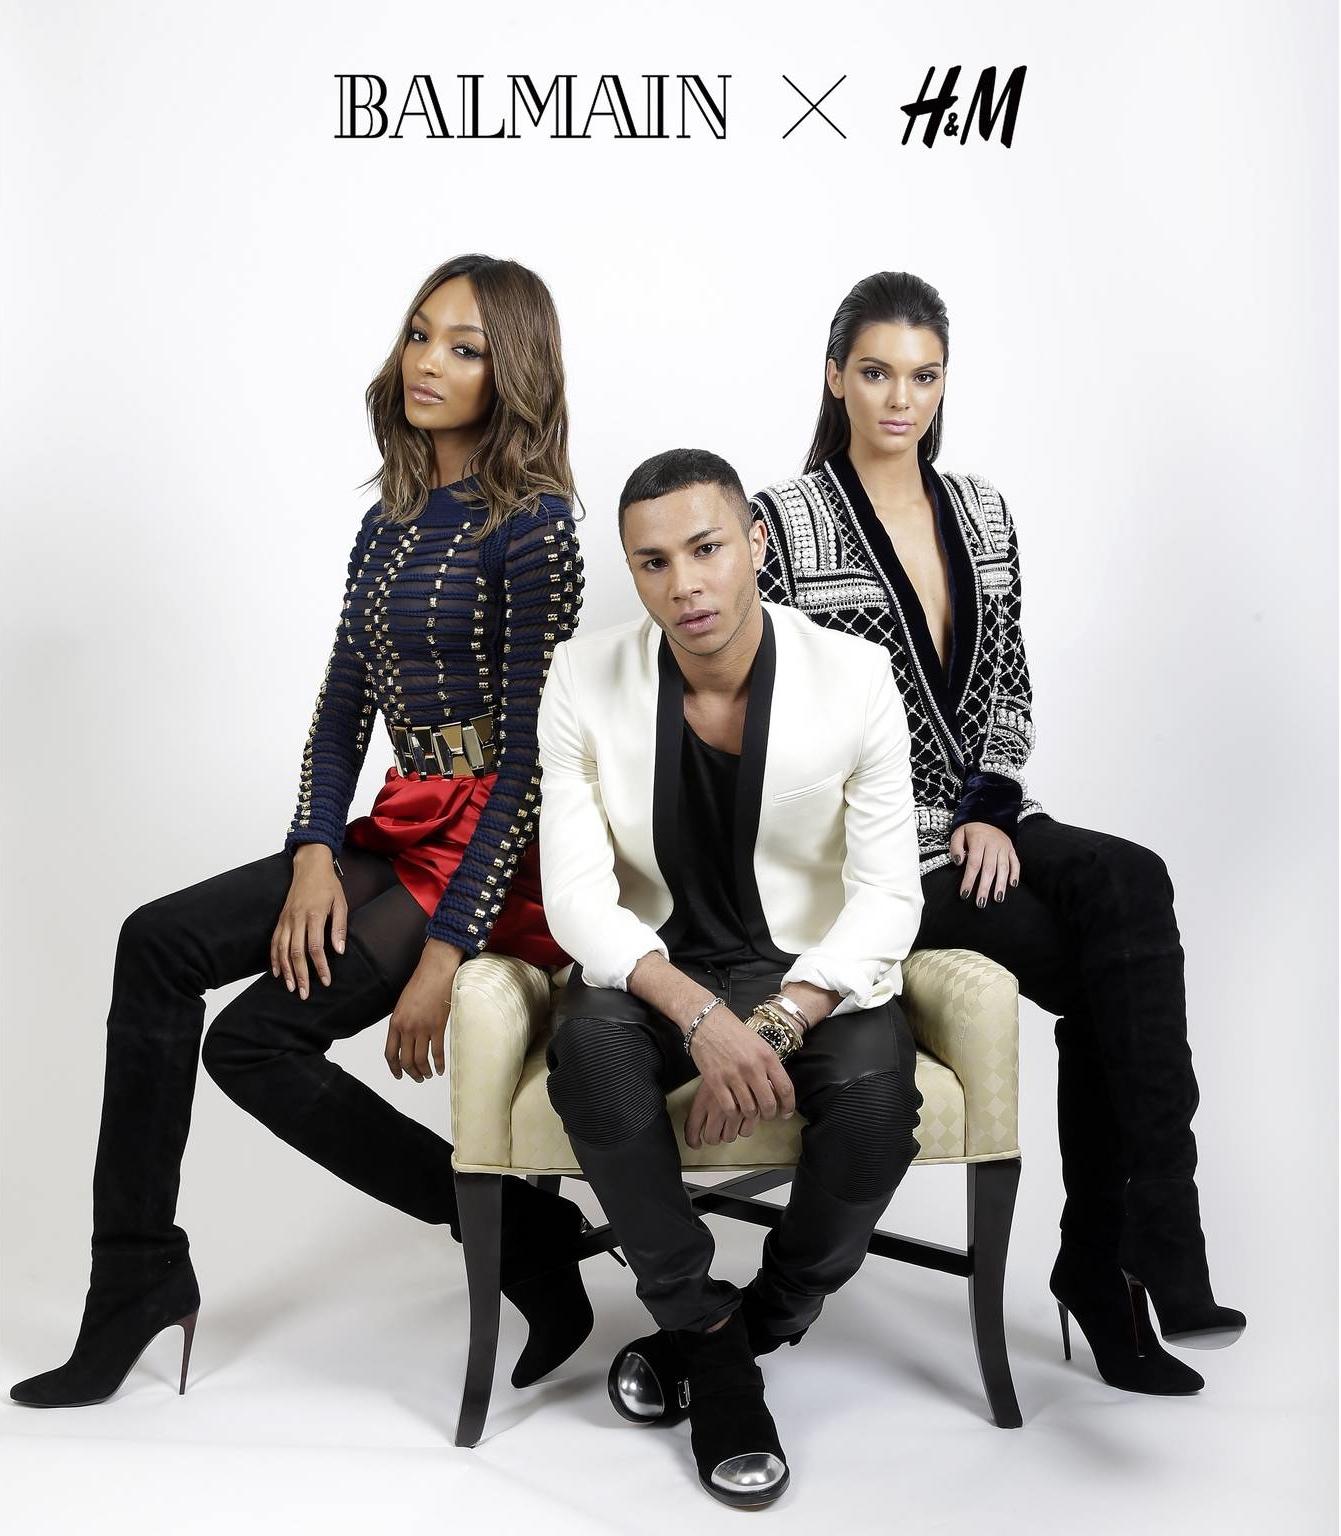 Fast Fashion, H&M, Balmain, moda masculina, menswear, blogger, fashion blogger, blog de moda, moda sem censura, alex cursino, style, estilo, parceria, top, coleção masculina,